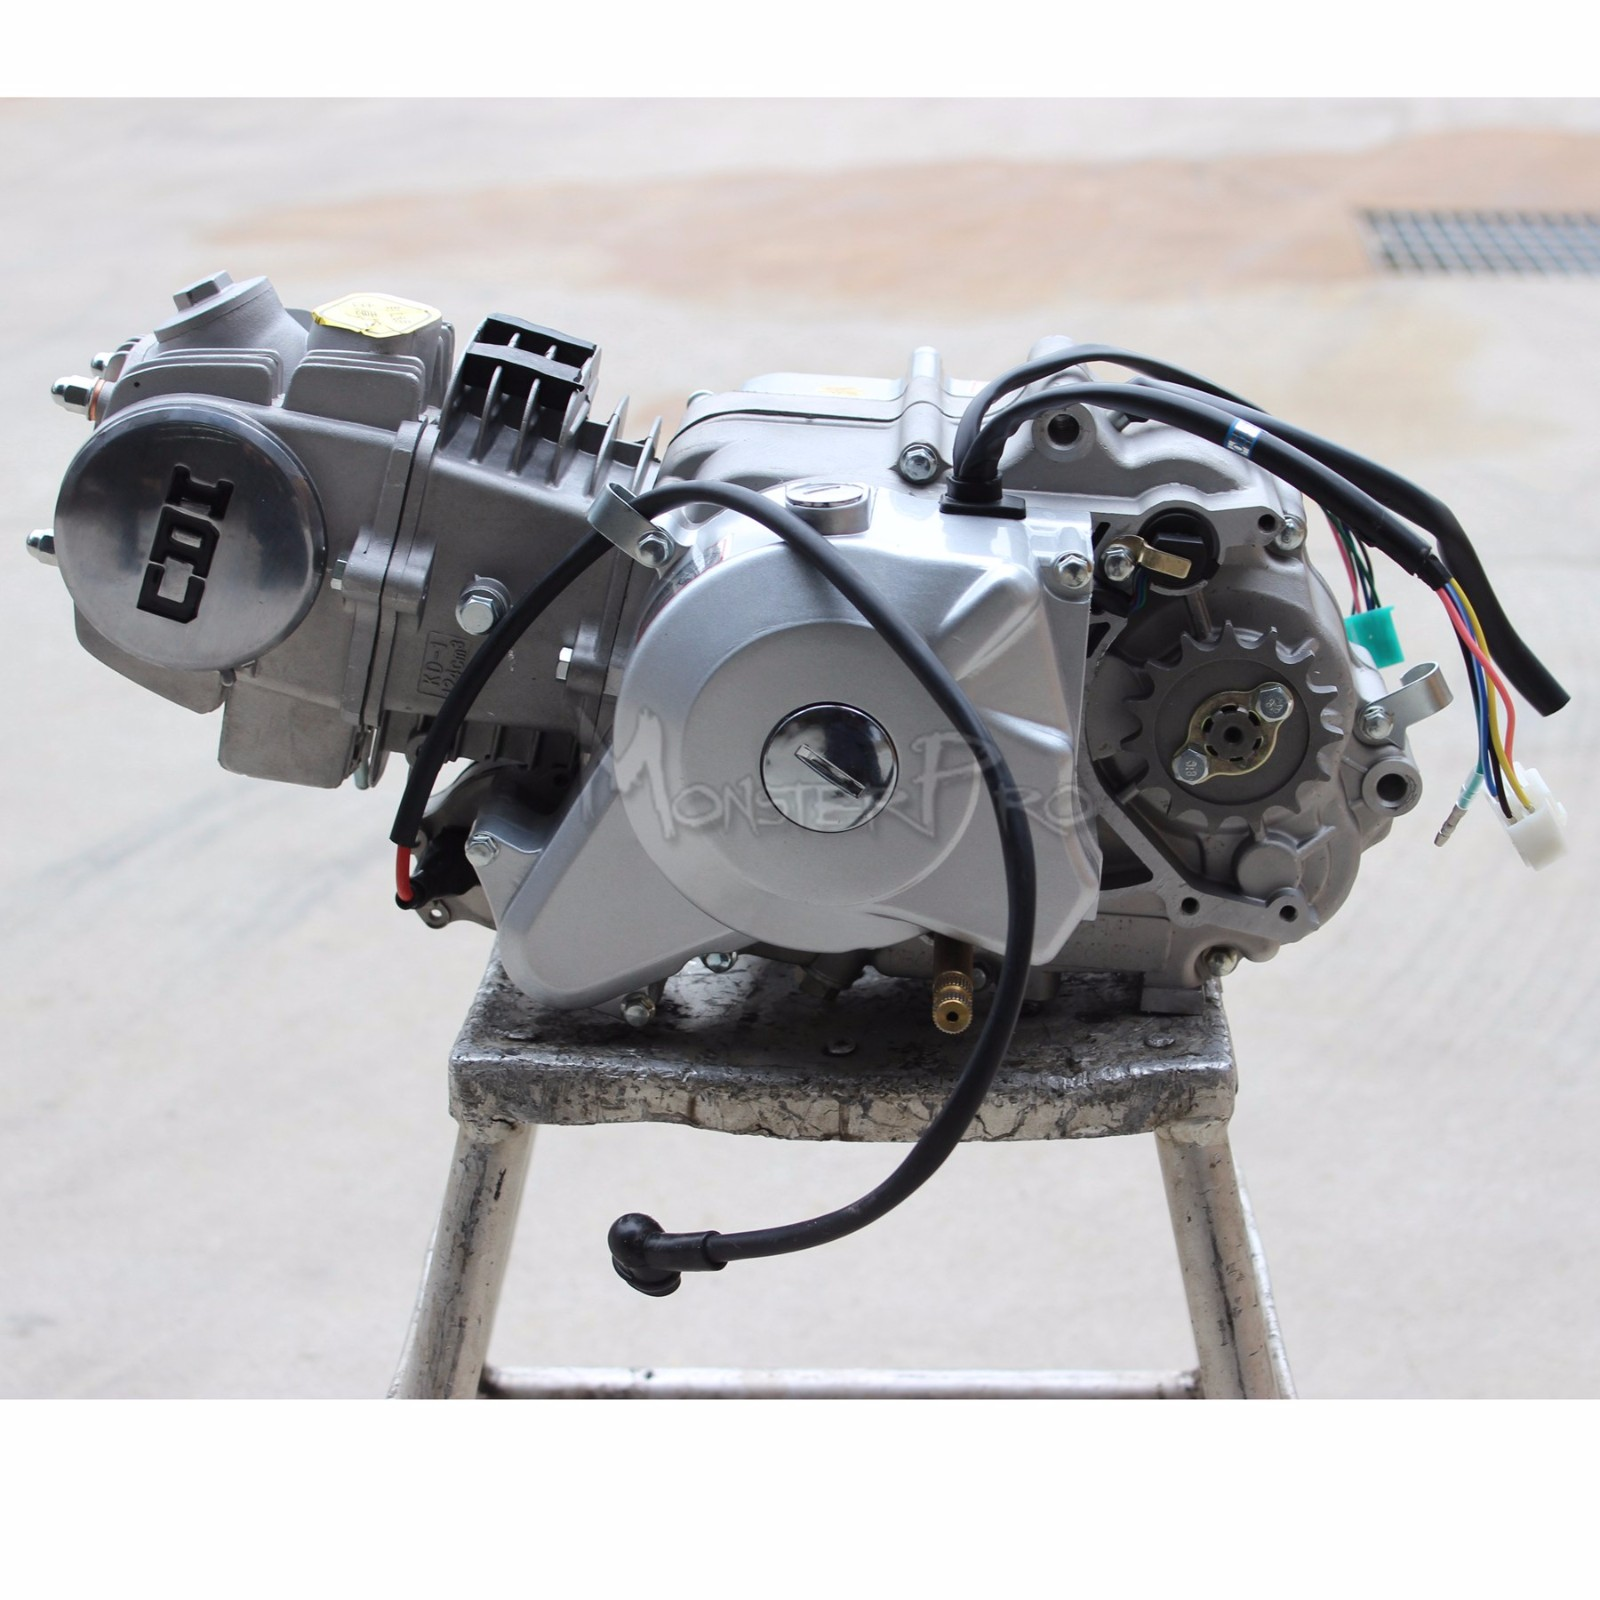 4 up 125cc Semi Auto Engine motor Kick/Elec Start Honda ...